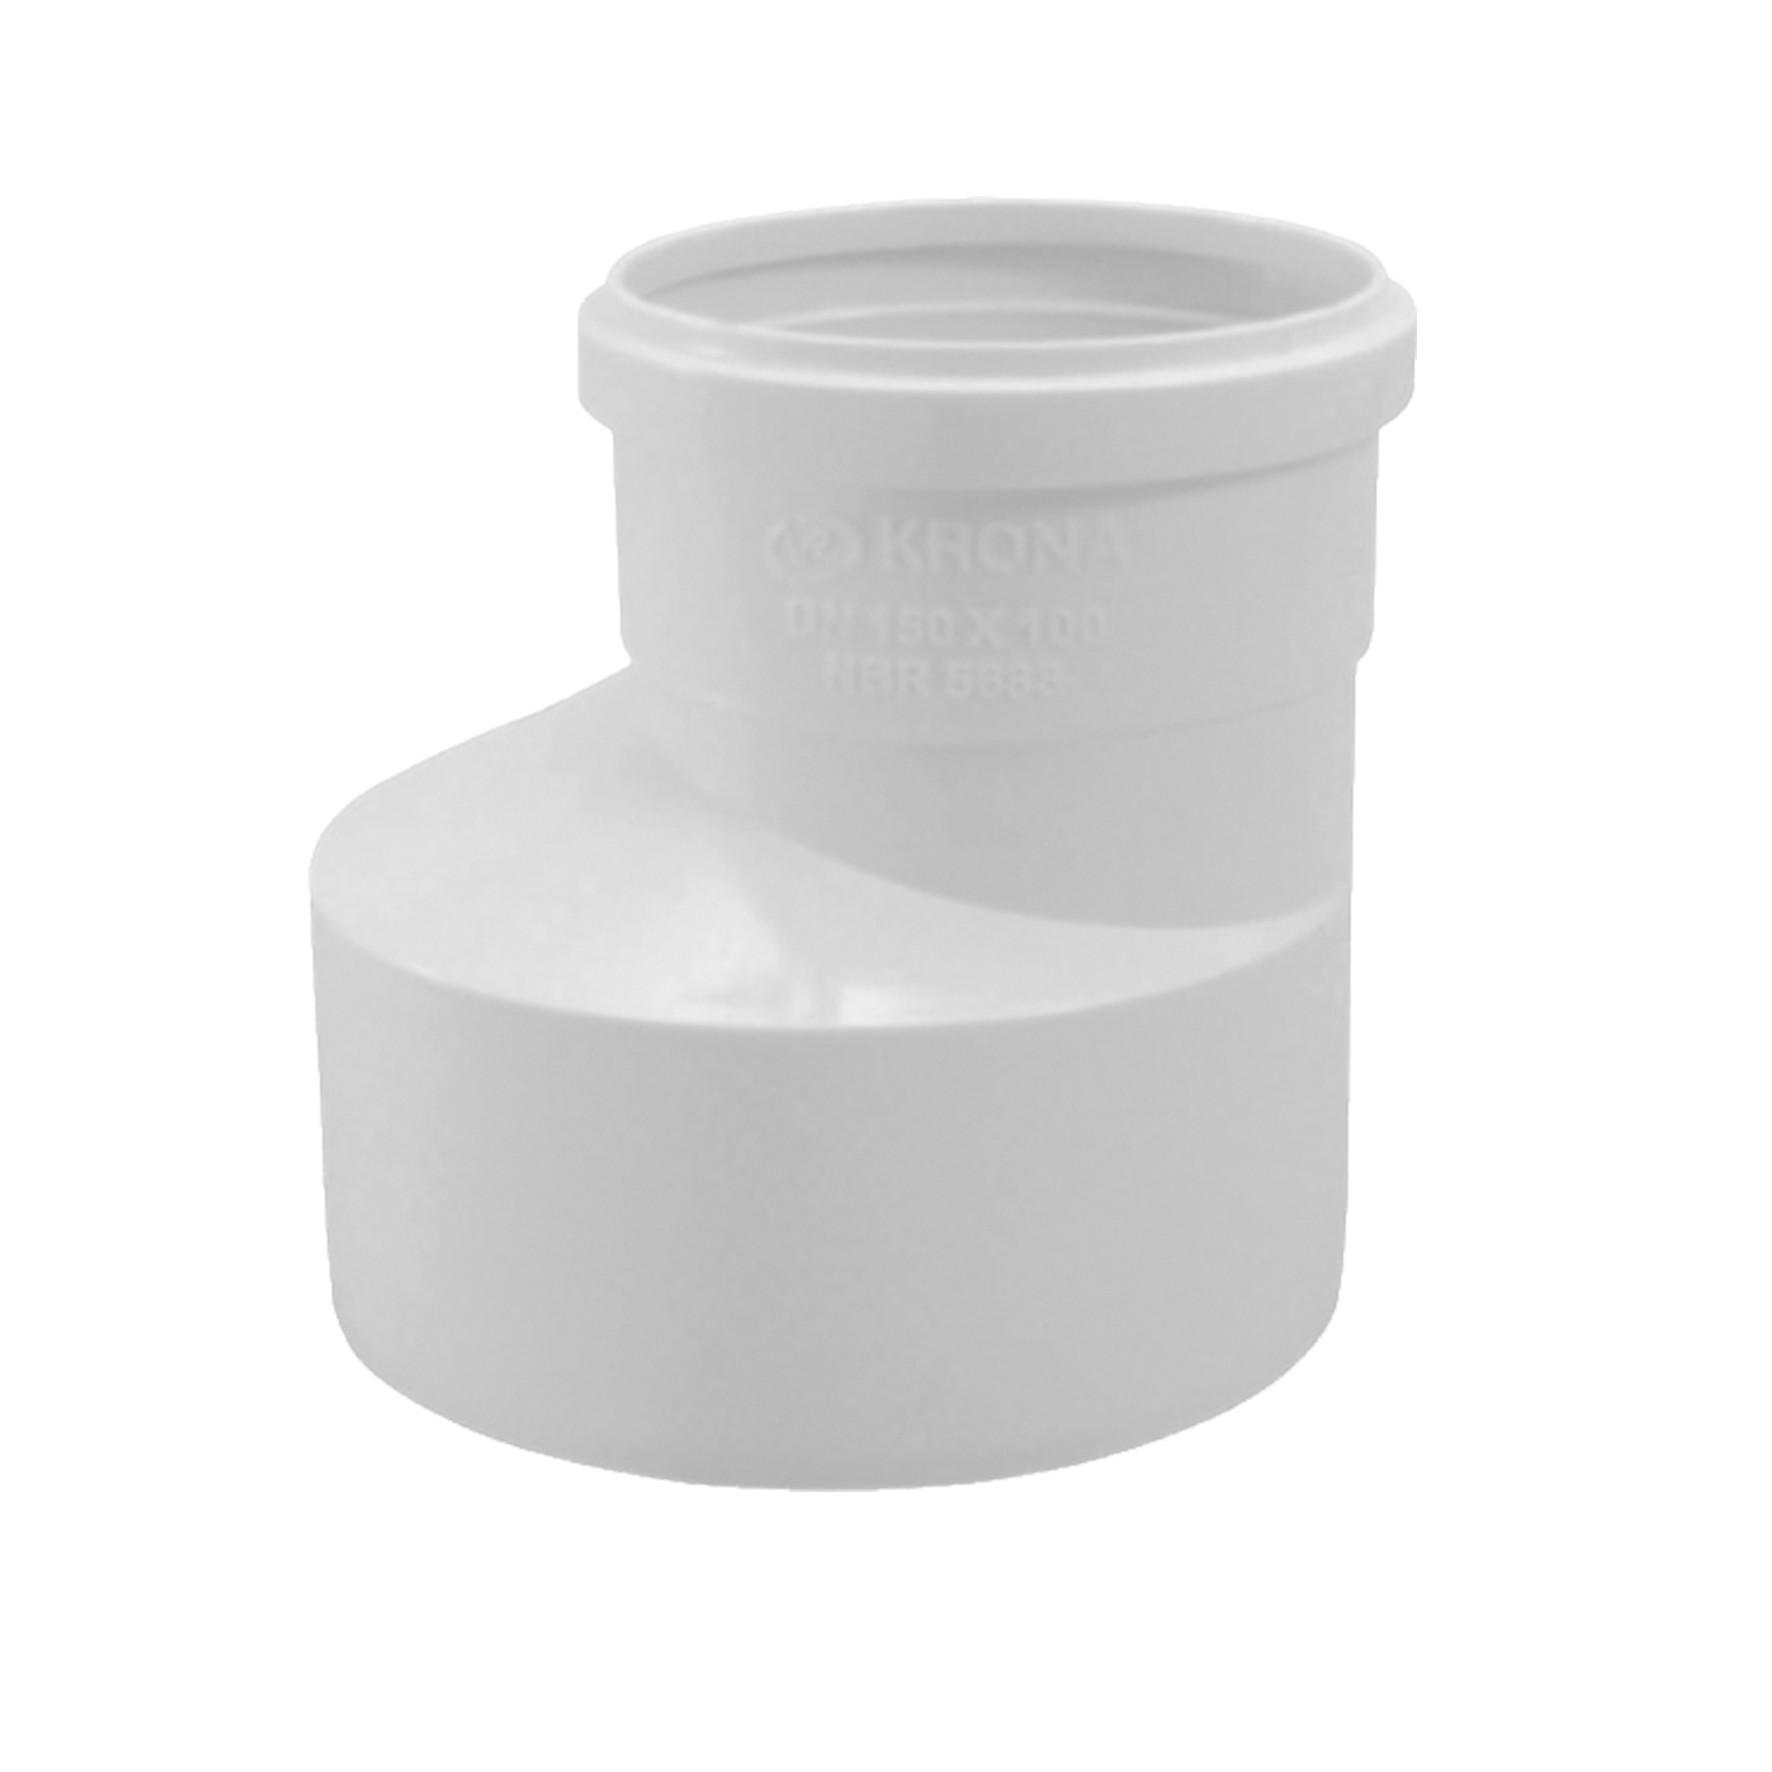 Reducao Excentrica PVC 200 mm - Krona